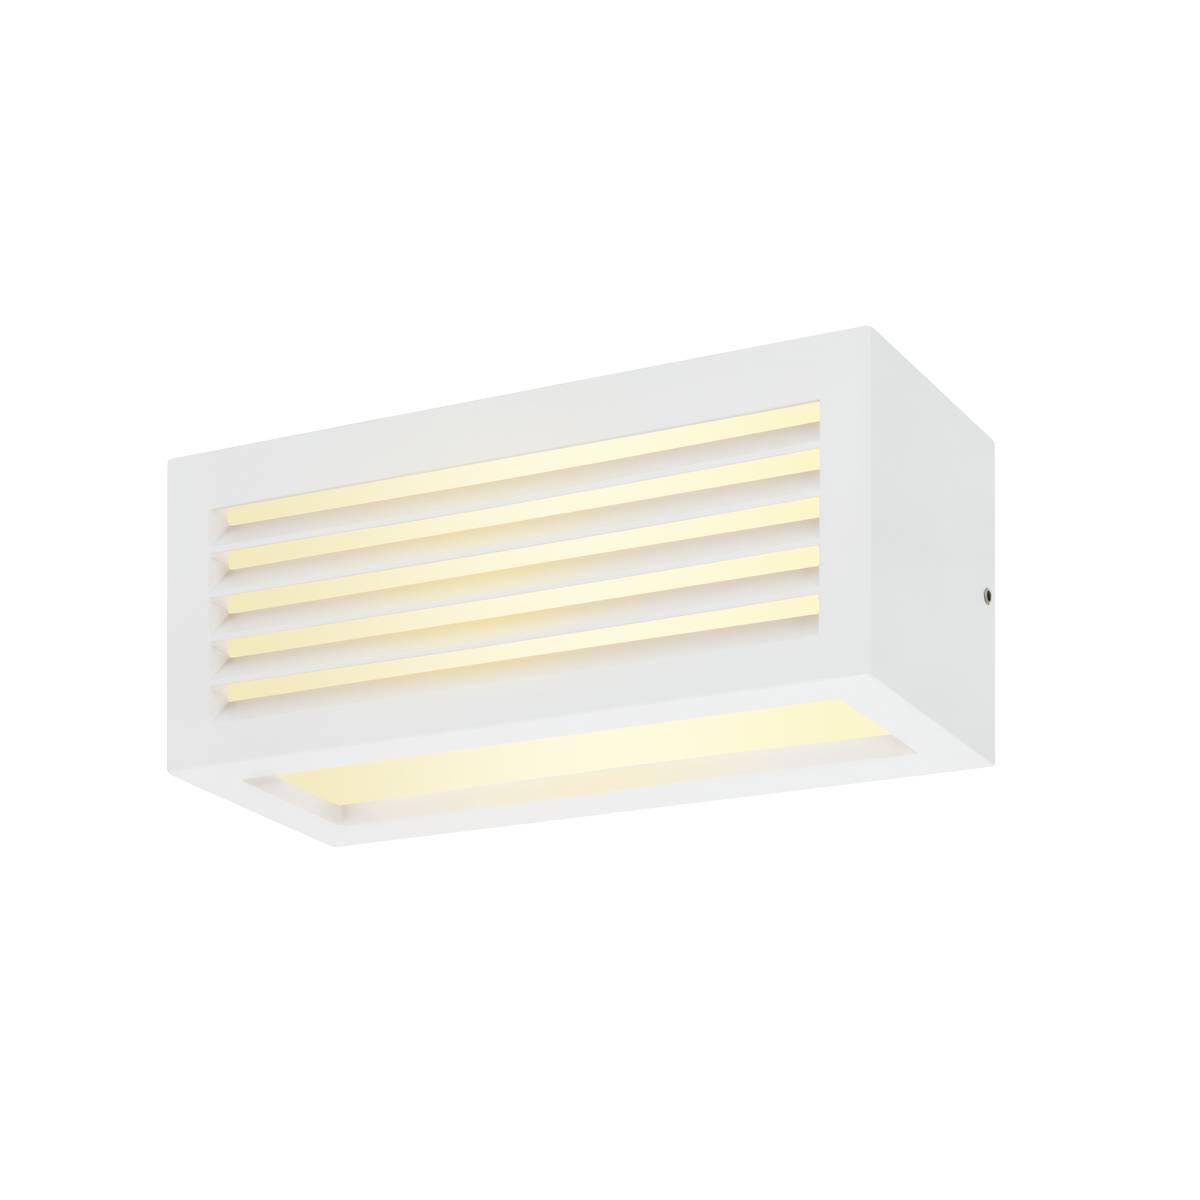 SLV buiten wandlamp Box-L - wit